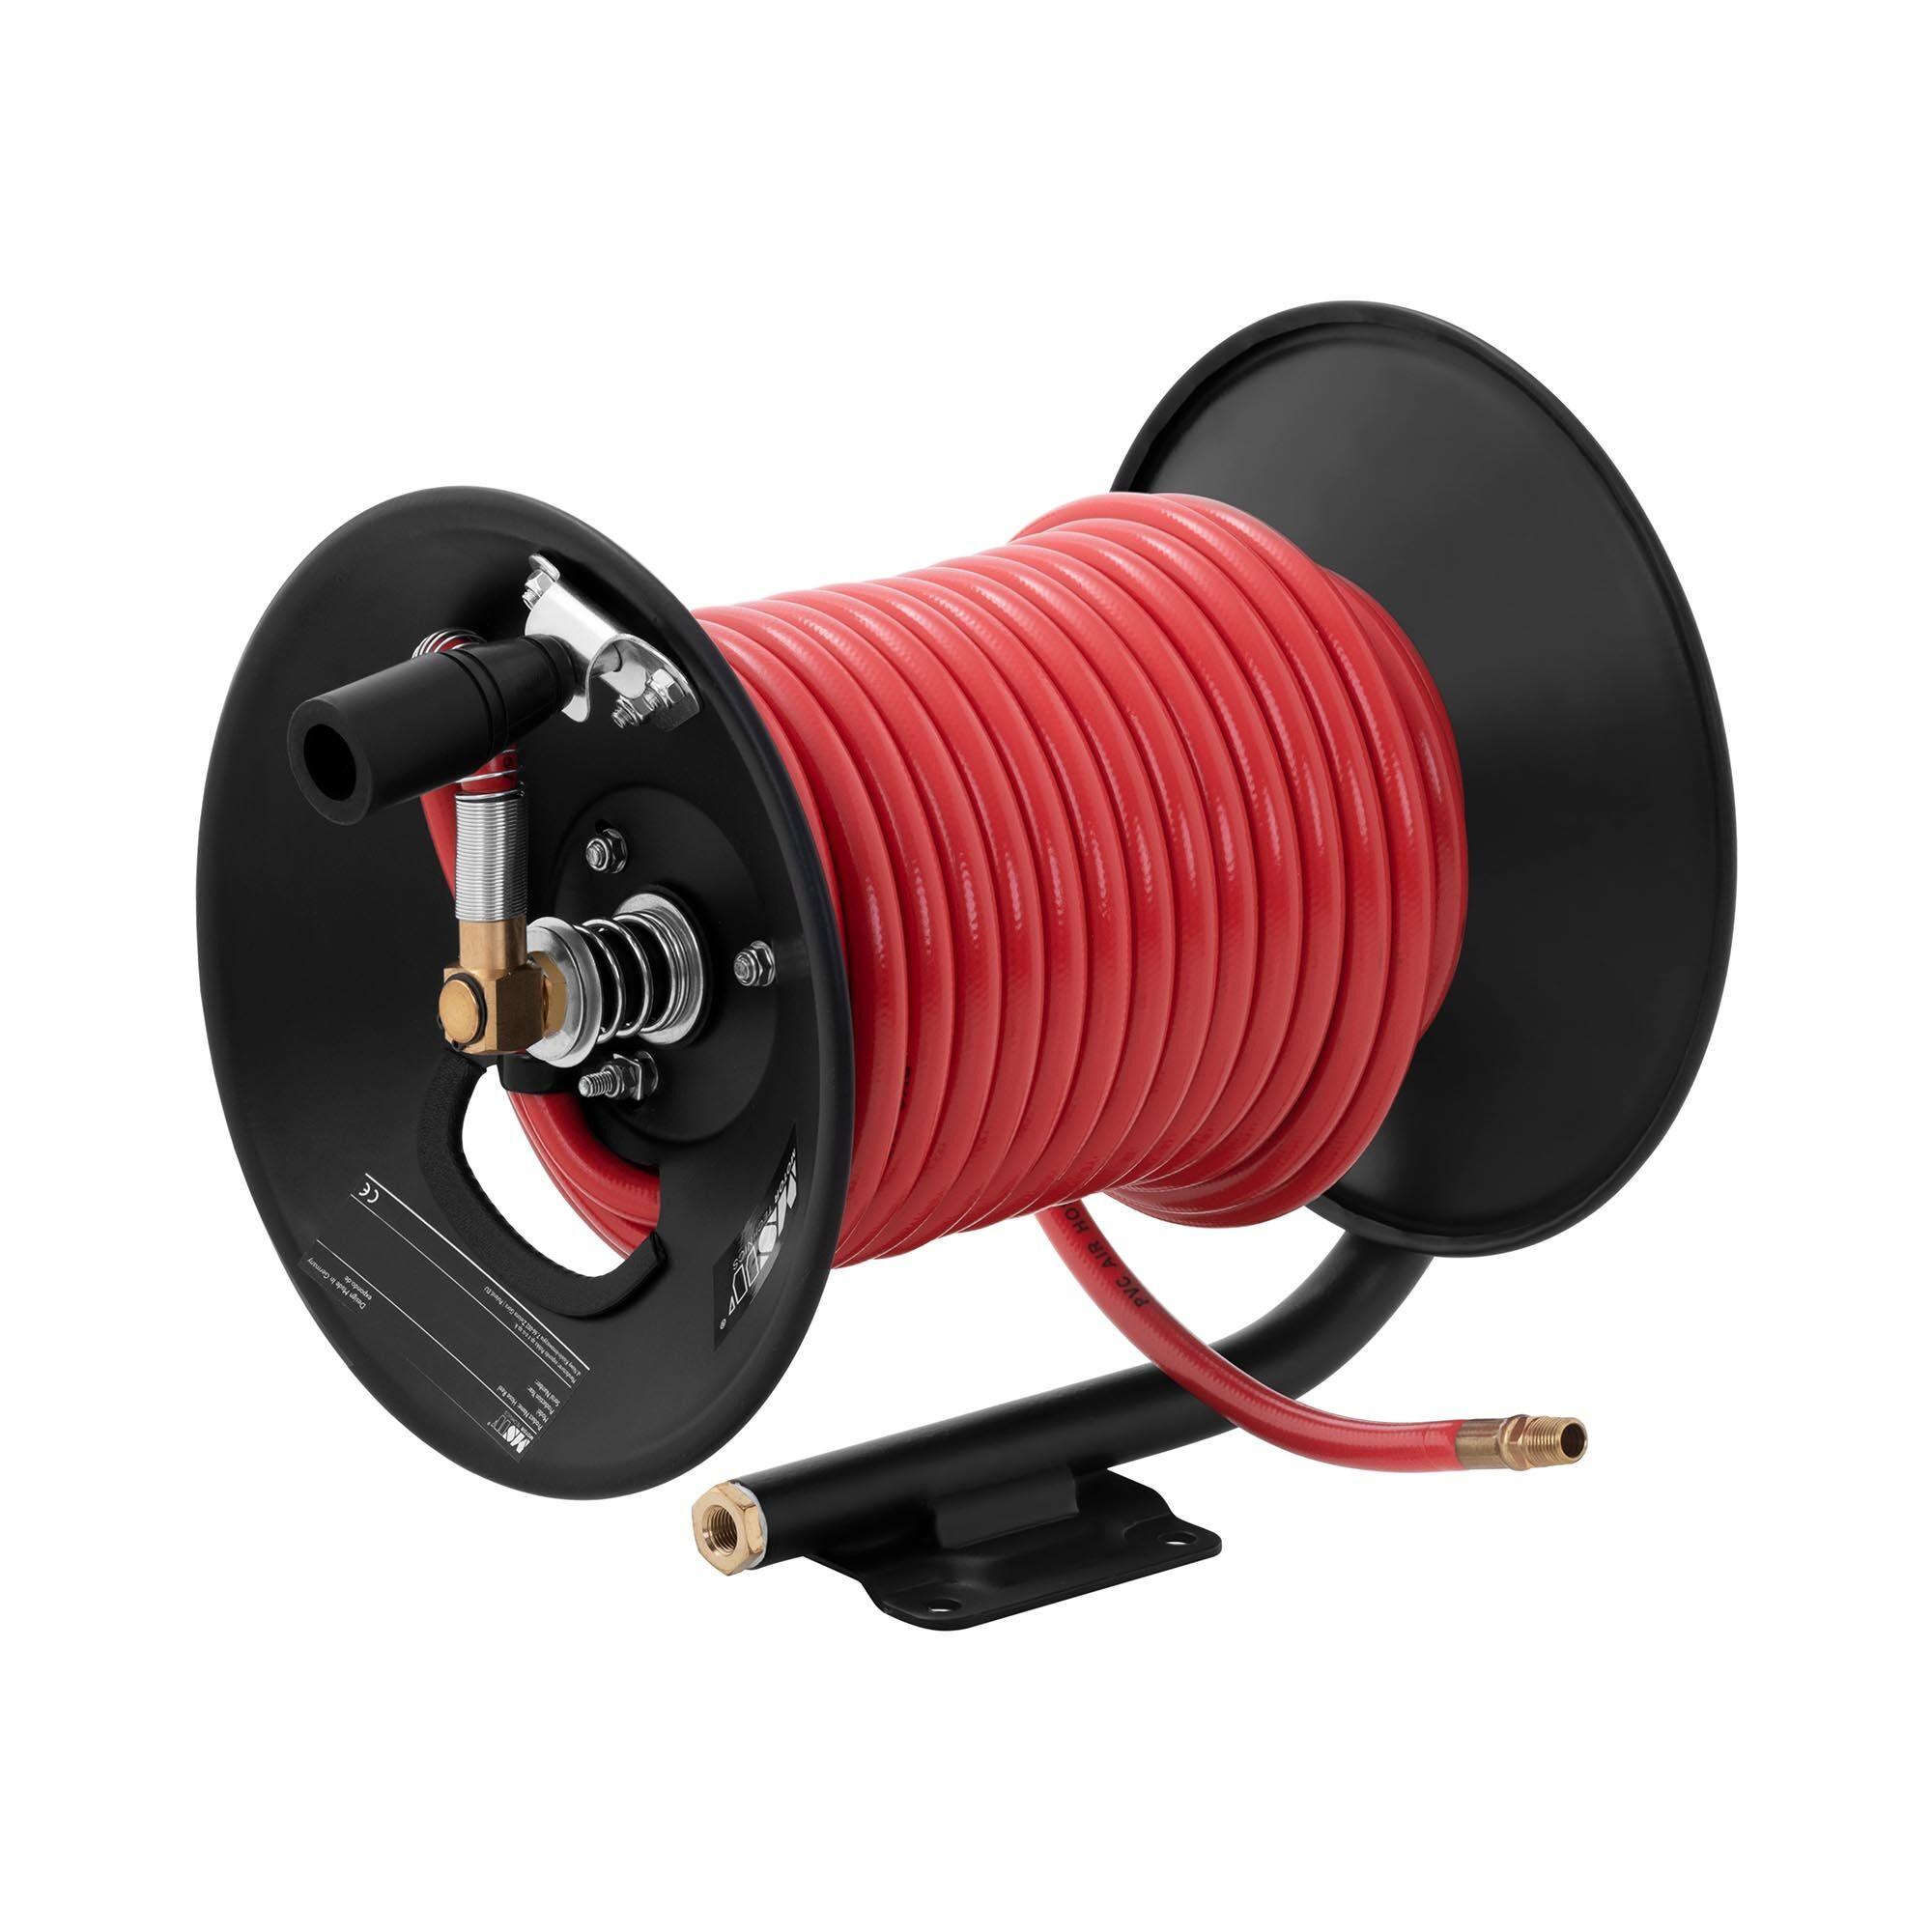 msw avvolgitubo aria compressa - 20 m - 250 bar -hr20